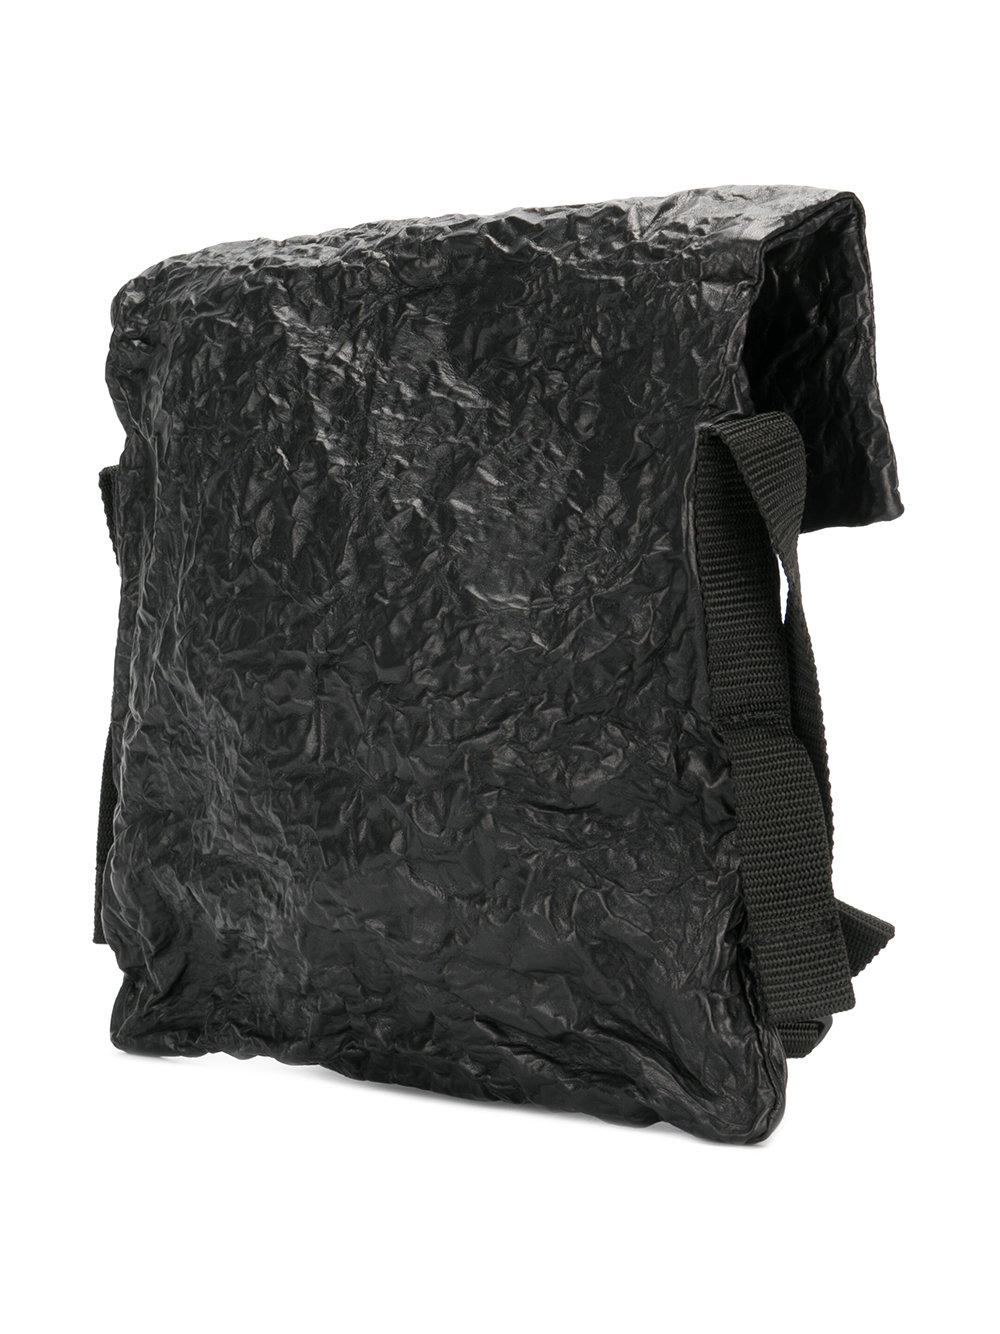 Rundholz Textured Crossbody Bag in Black